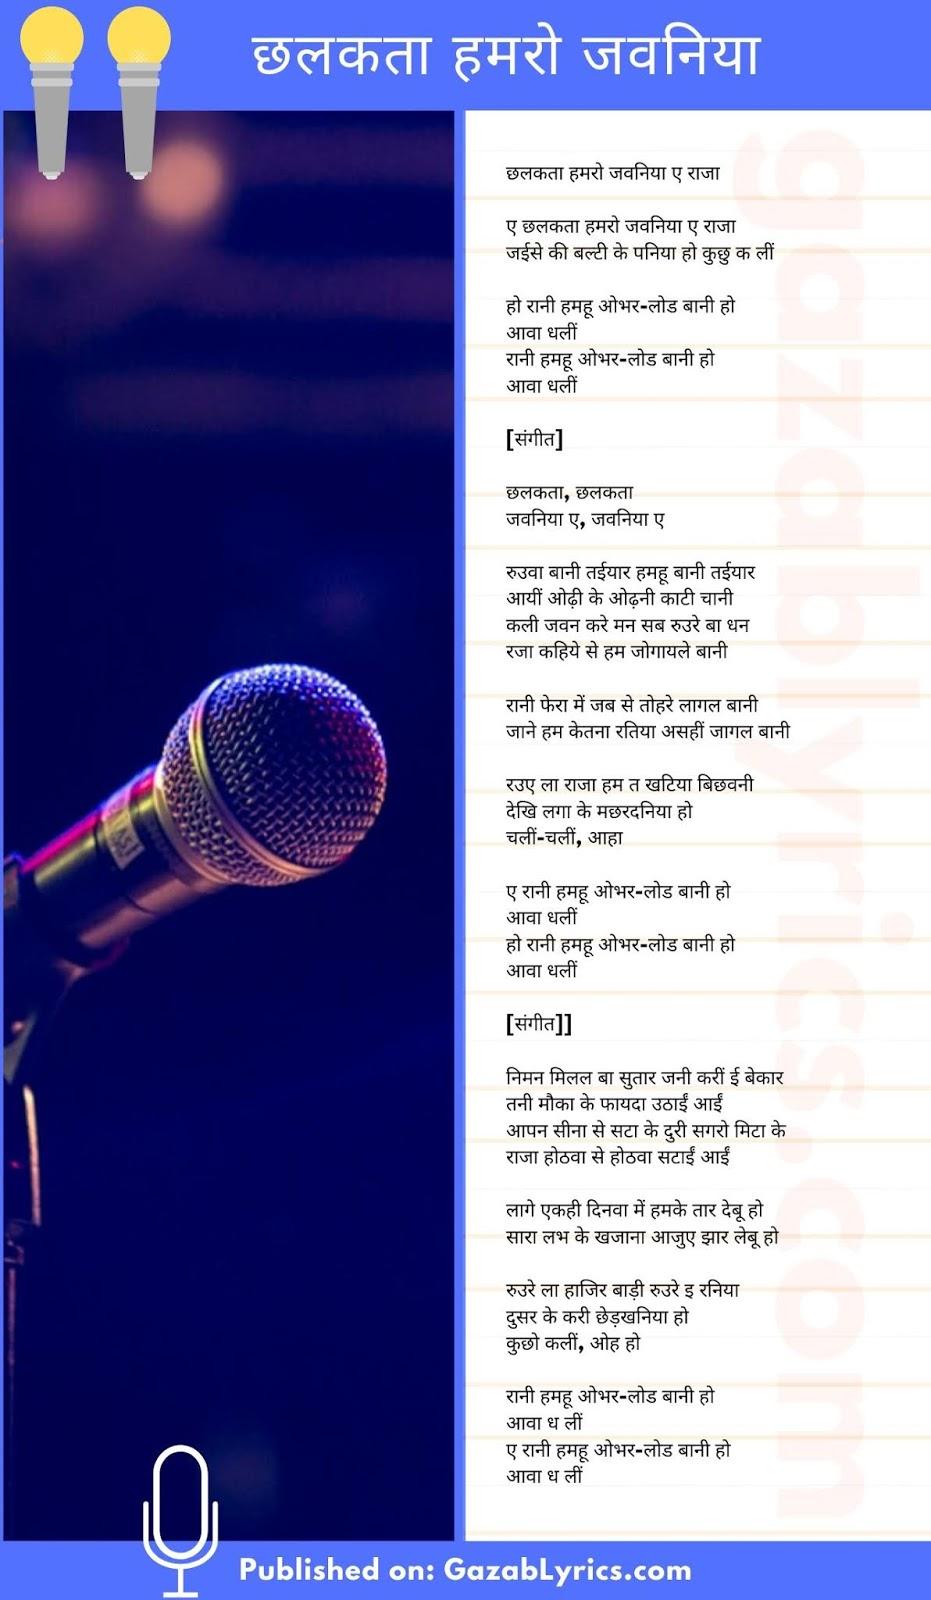 Chhalakata Hamro Jawaniya song lyrics image